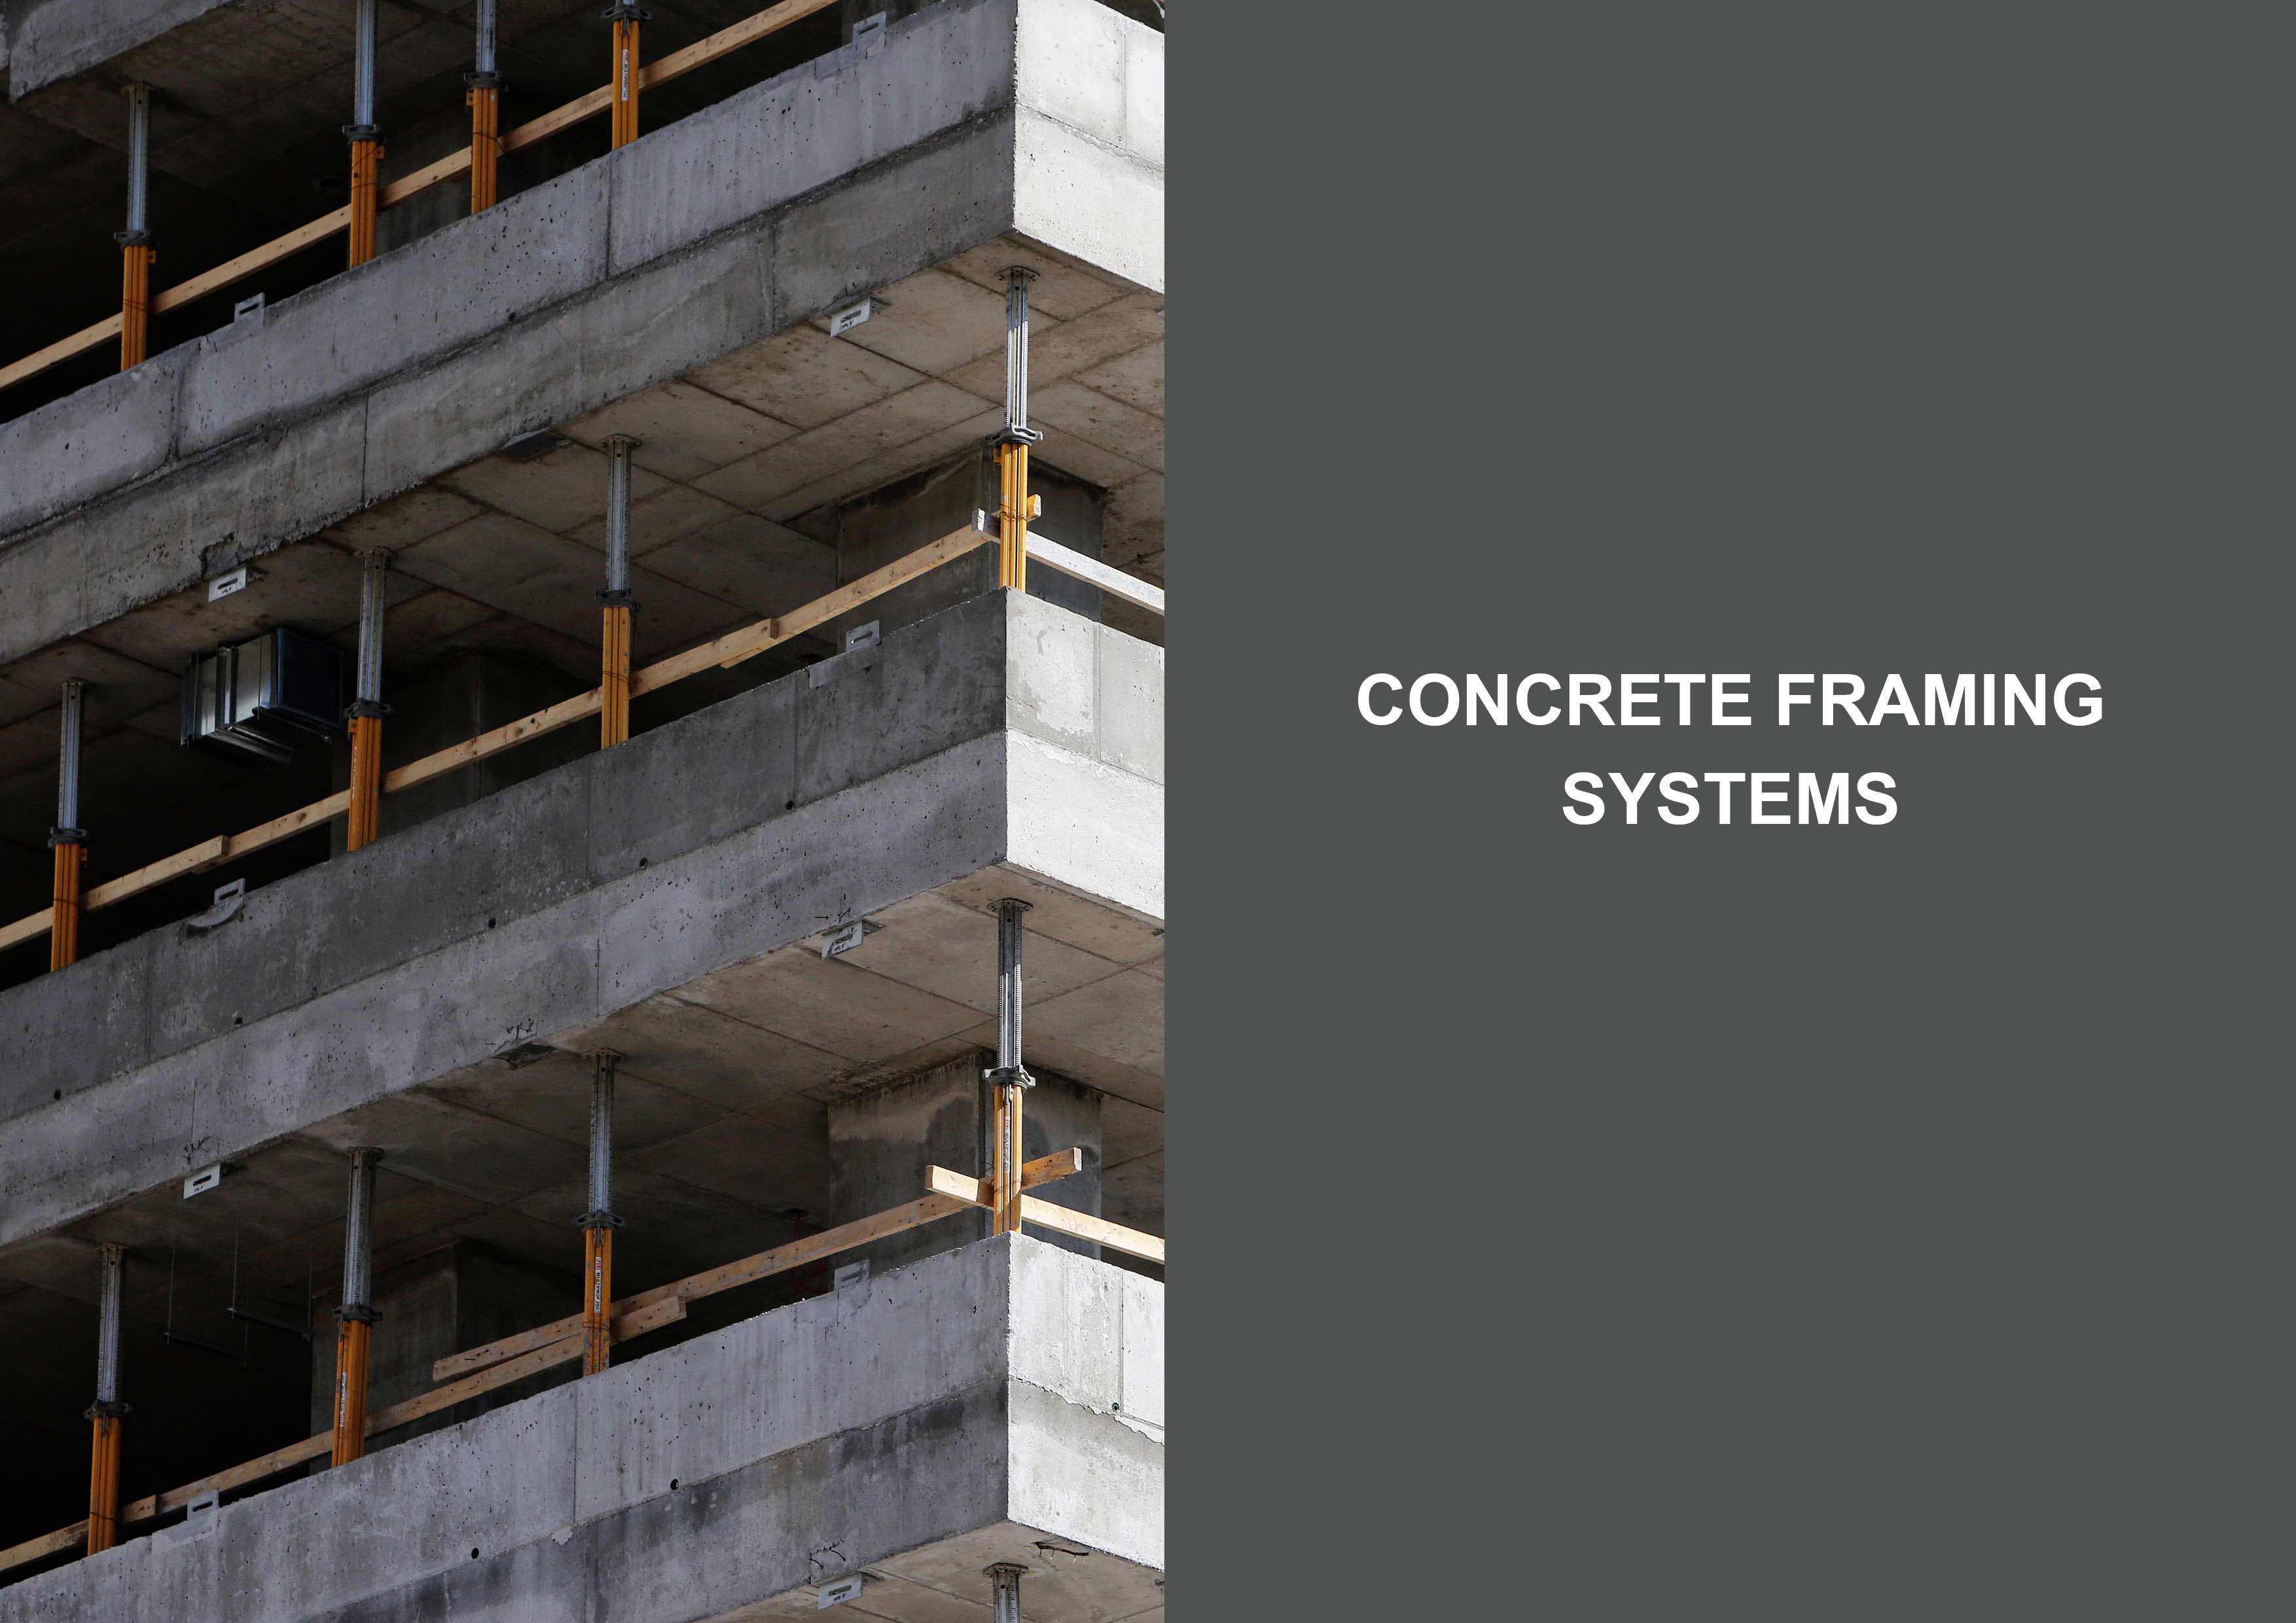 Concrete Framing Systems